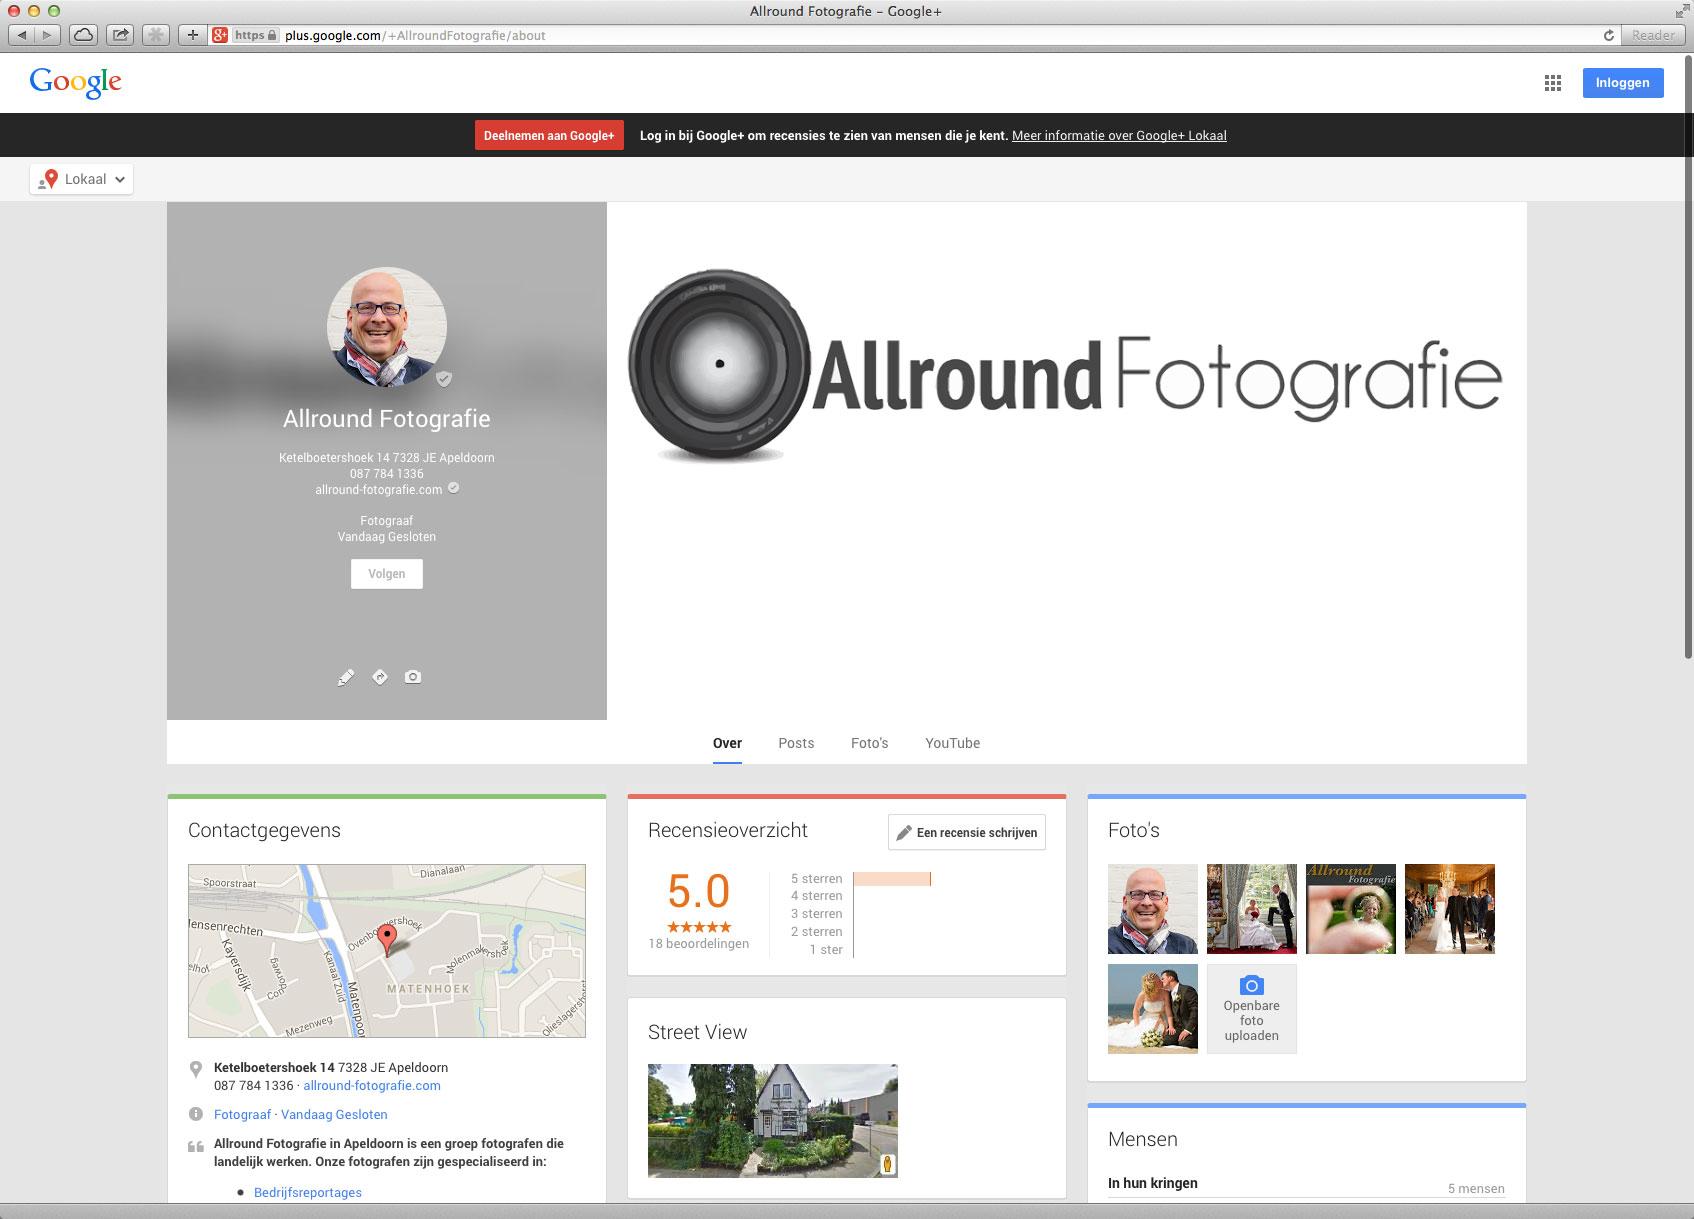 Allround Fotografie op Google+